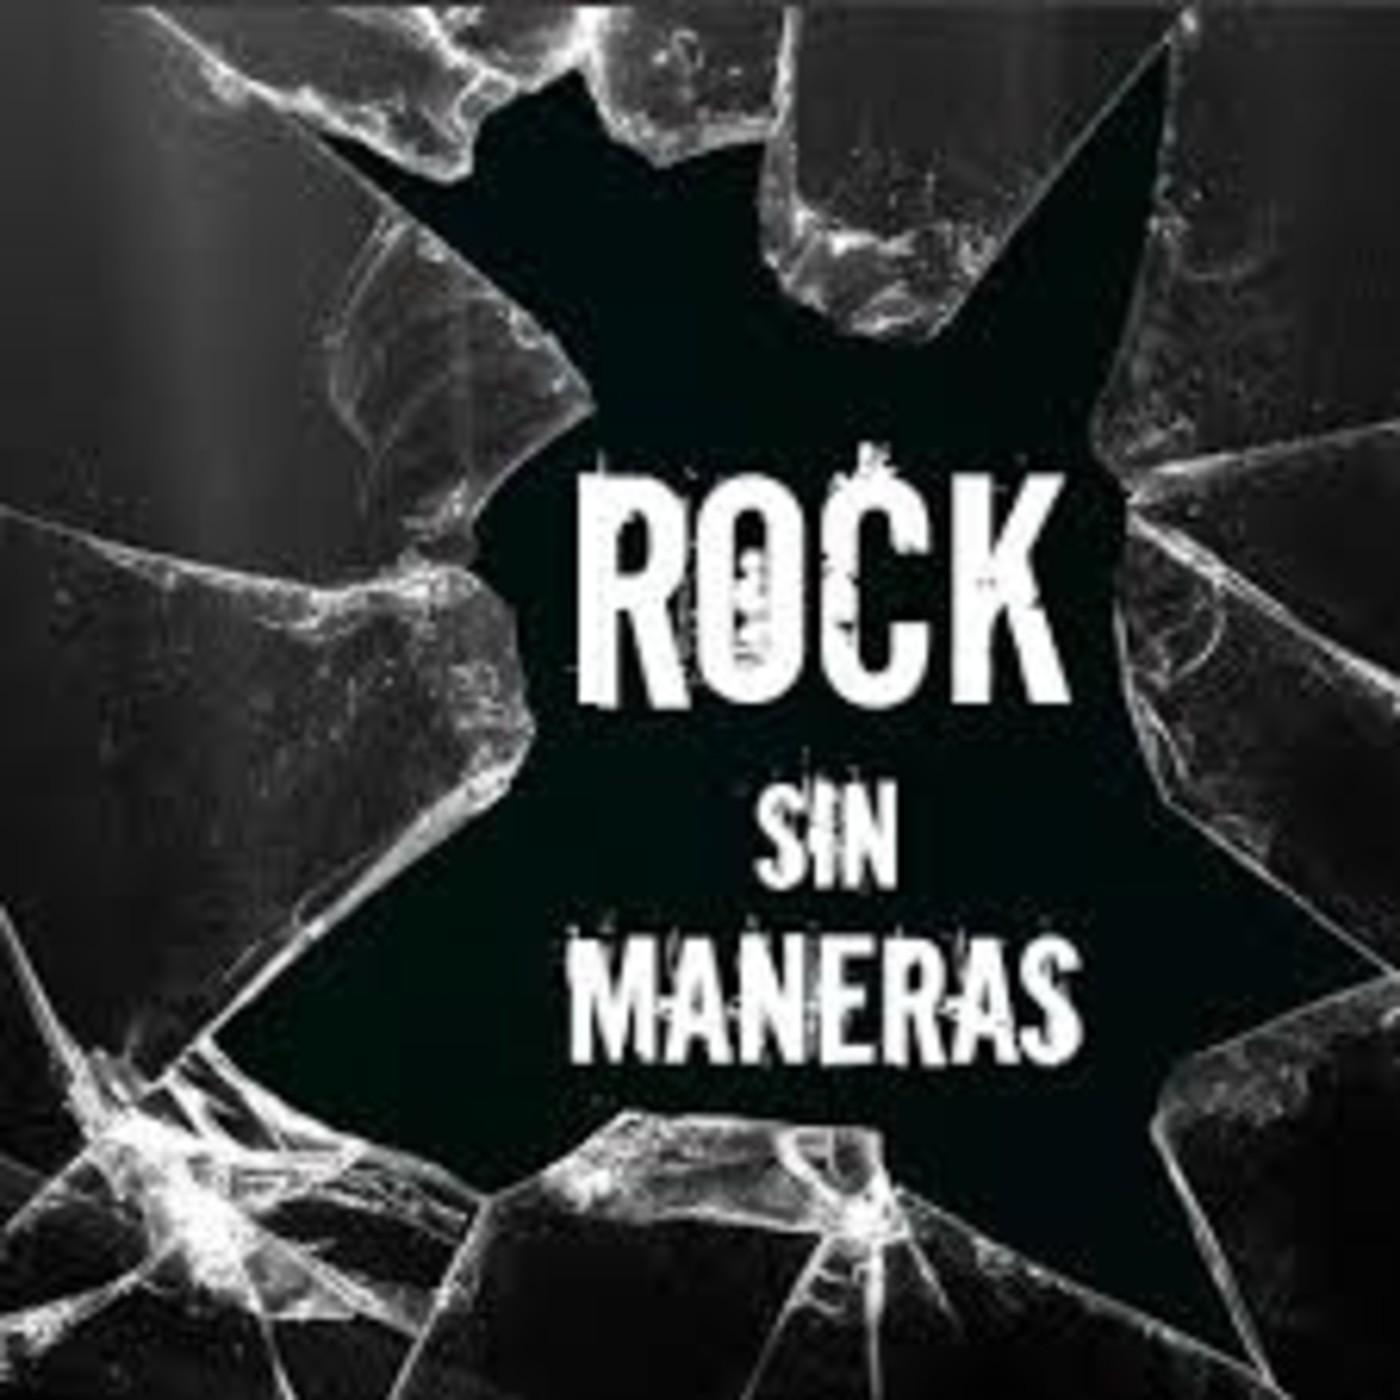 RocksinManeras 05x05: entrevista ARENIA + rock